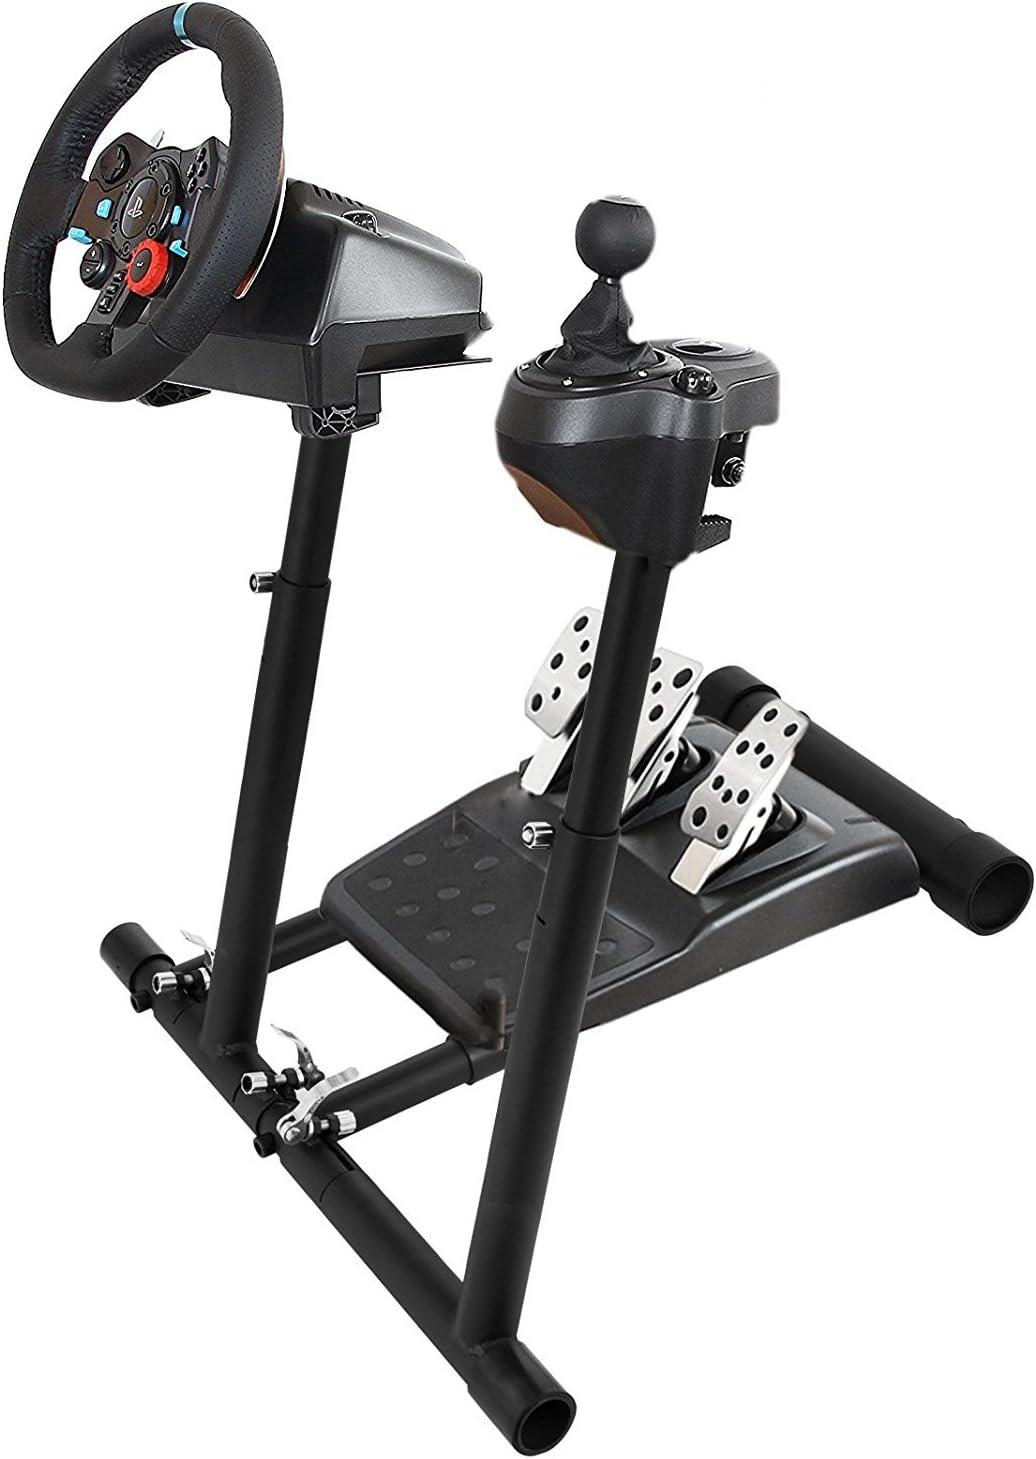 Autovictoria Soporte del Volante para Logitech G29 G920 G27 G25 para PS3 PS4 XBOX No Incluye Silla Volante y Pedal